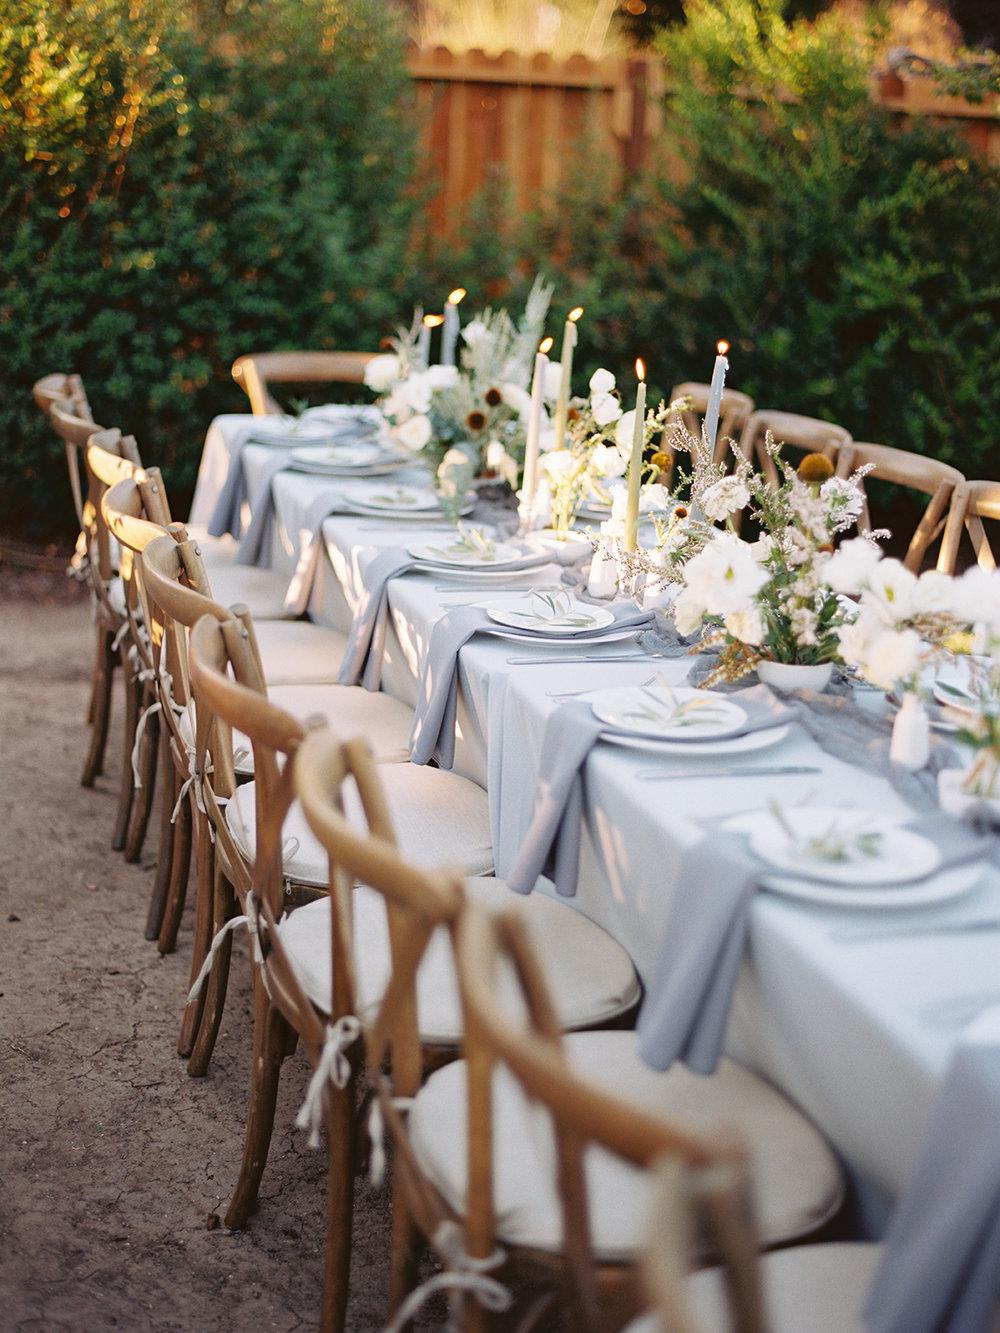 008-brian-sarra-los-angeles-wedding-brumley-wells-photography.jpg